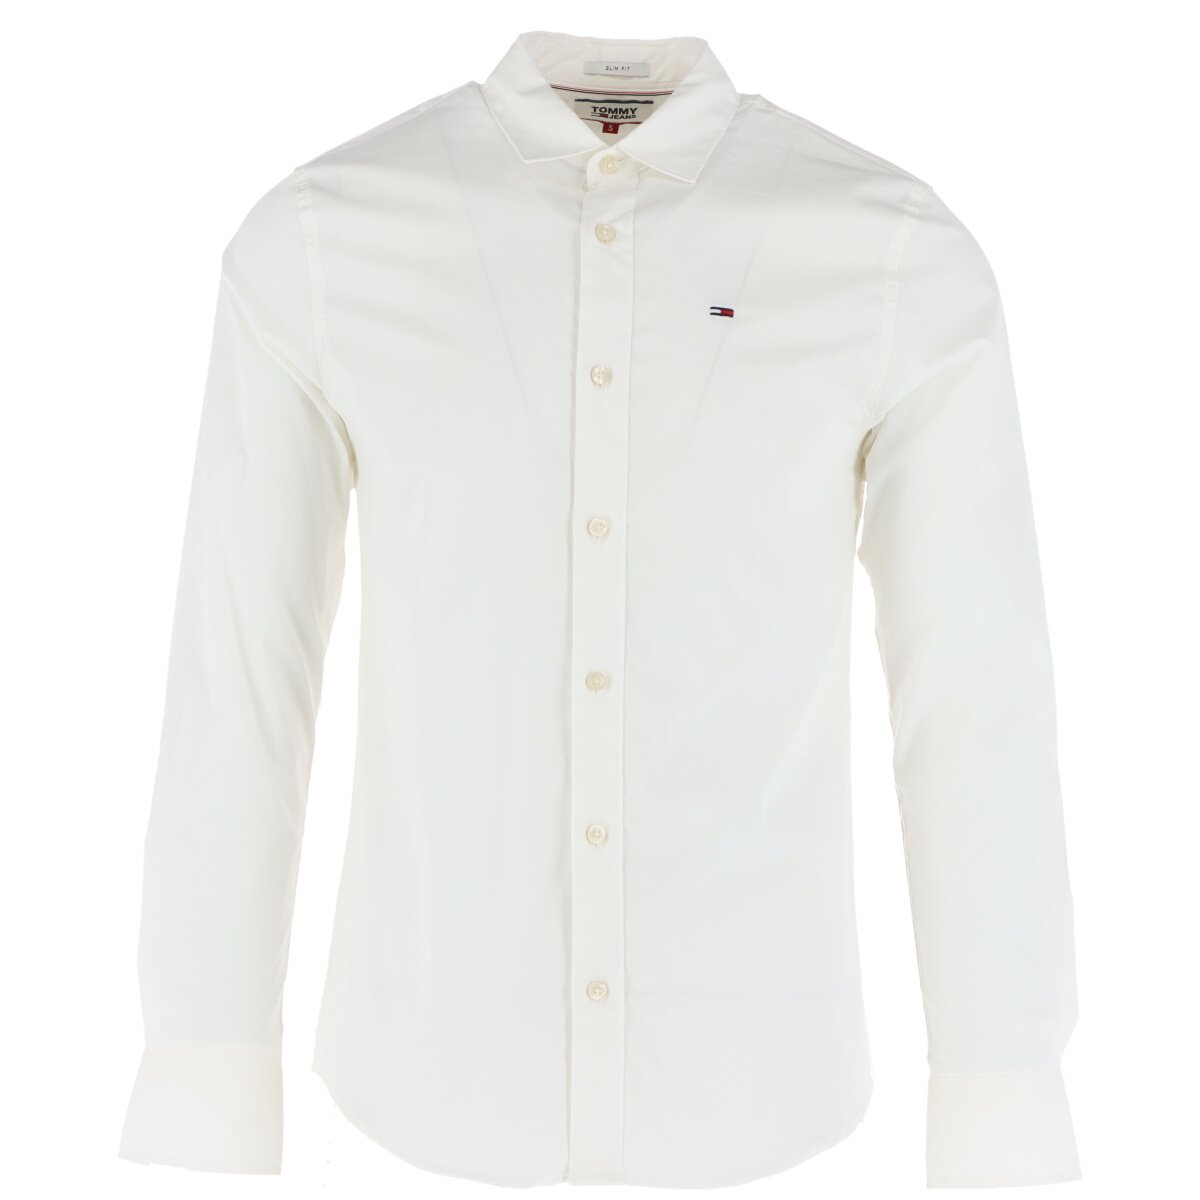 Tommy Hilfiger Jeans Men's Shirt White 273505 - white XS